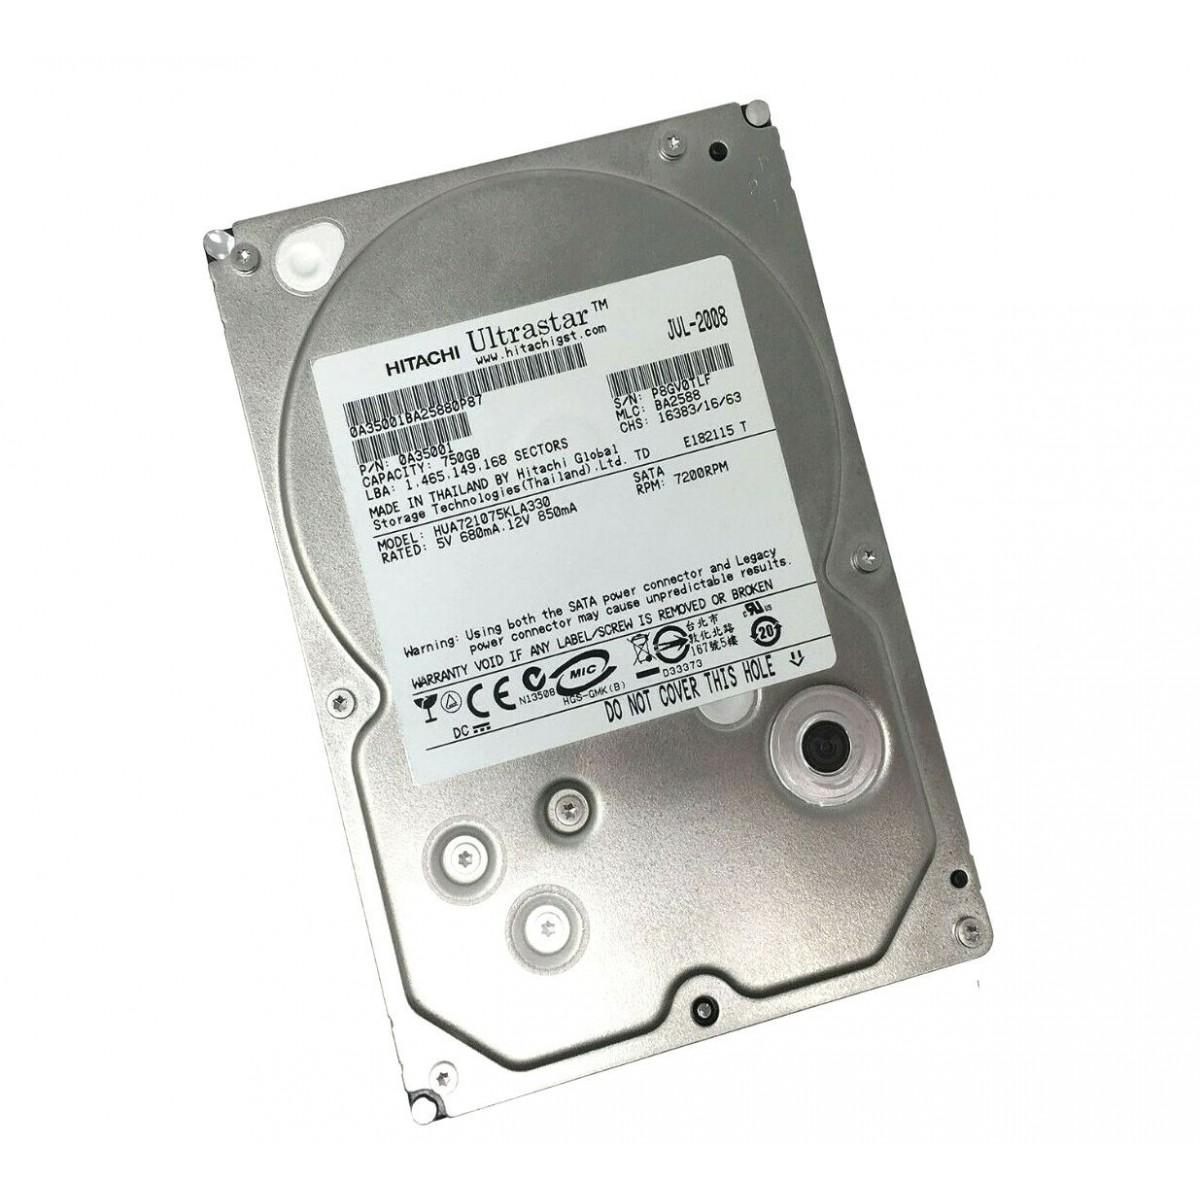 PLYTA GLOWNA do DELL POWEREDGE R510 0DPRFK